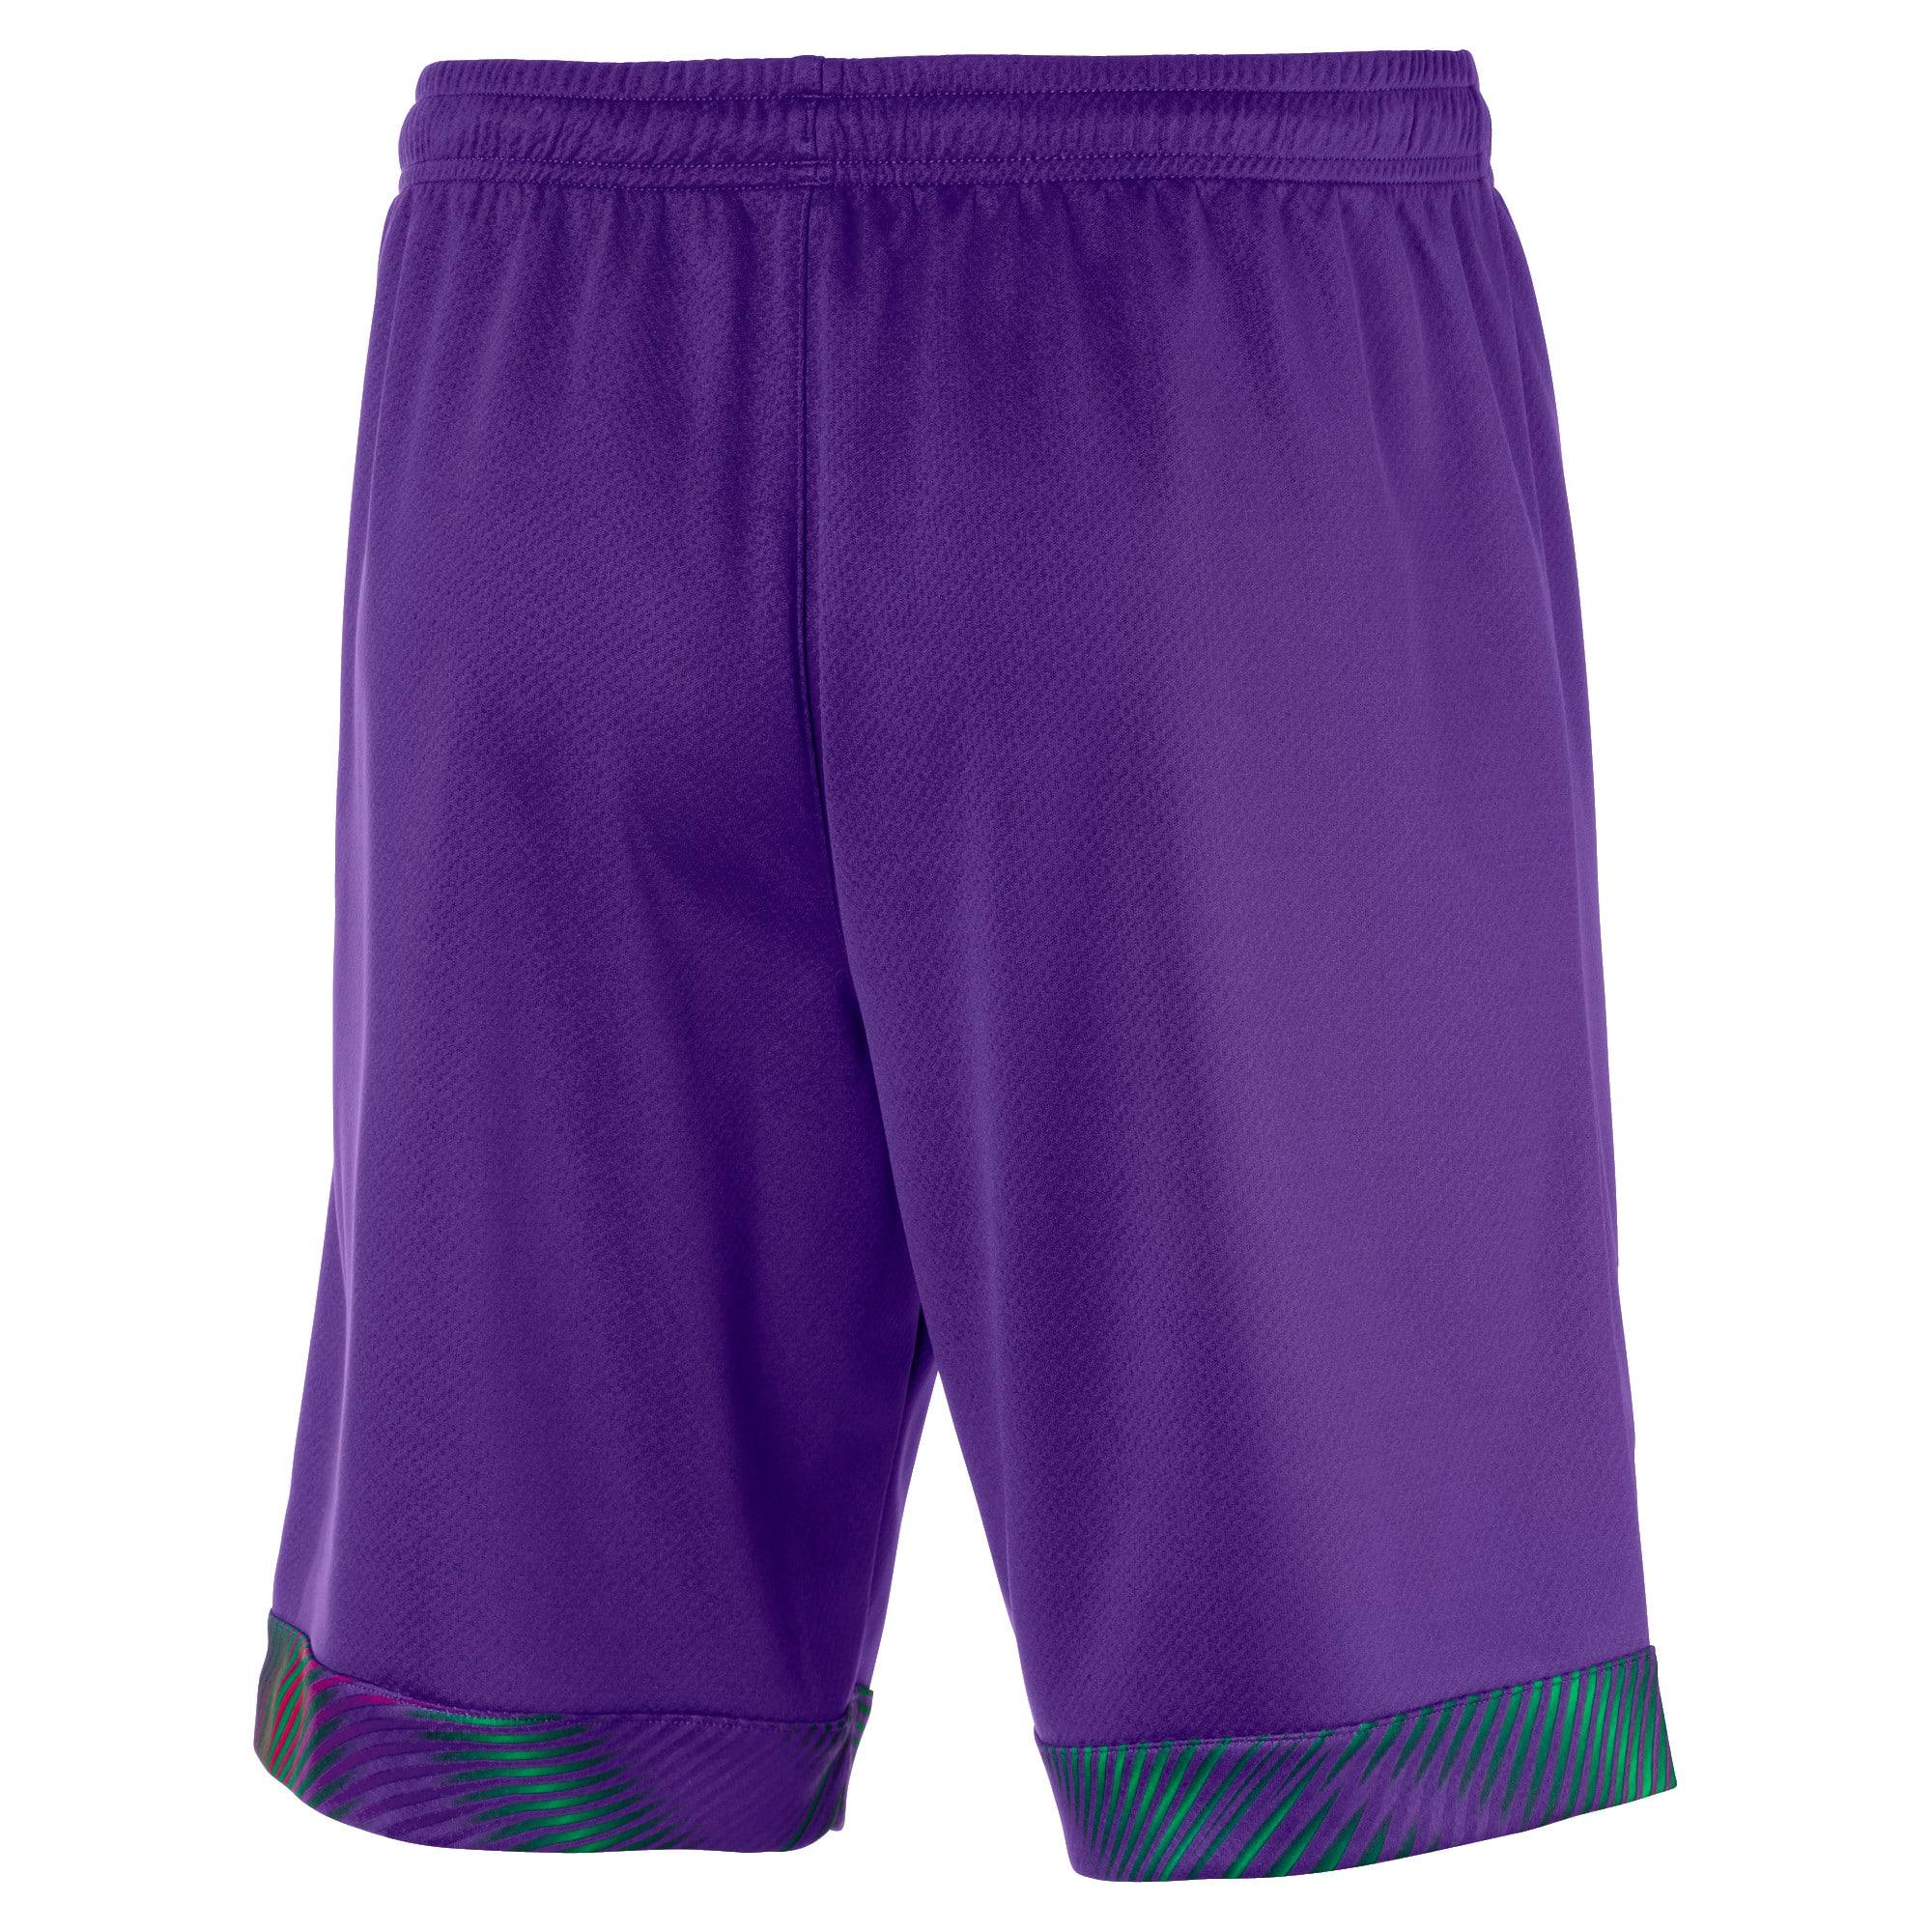 Thumbnail 2 of Borussia Mönchengladbach Men's Goalkeeper Replica Shorts, Prism Violet, medium